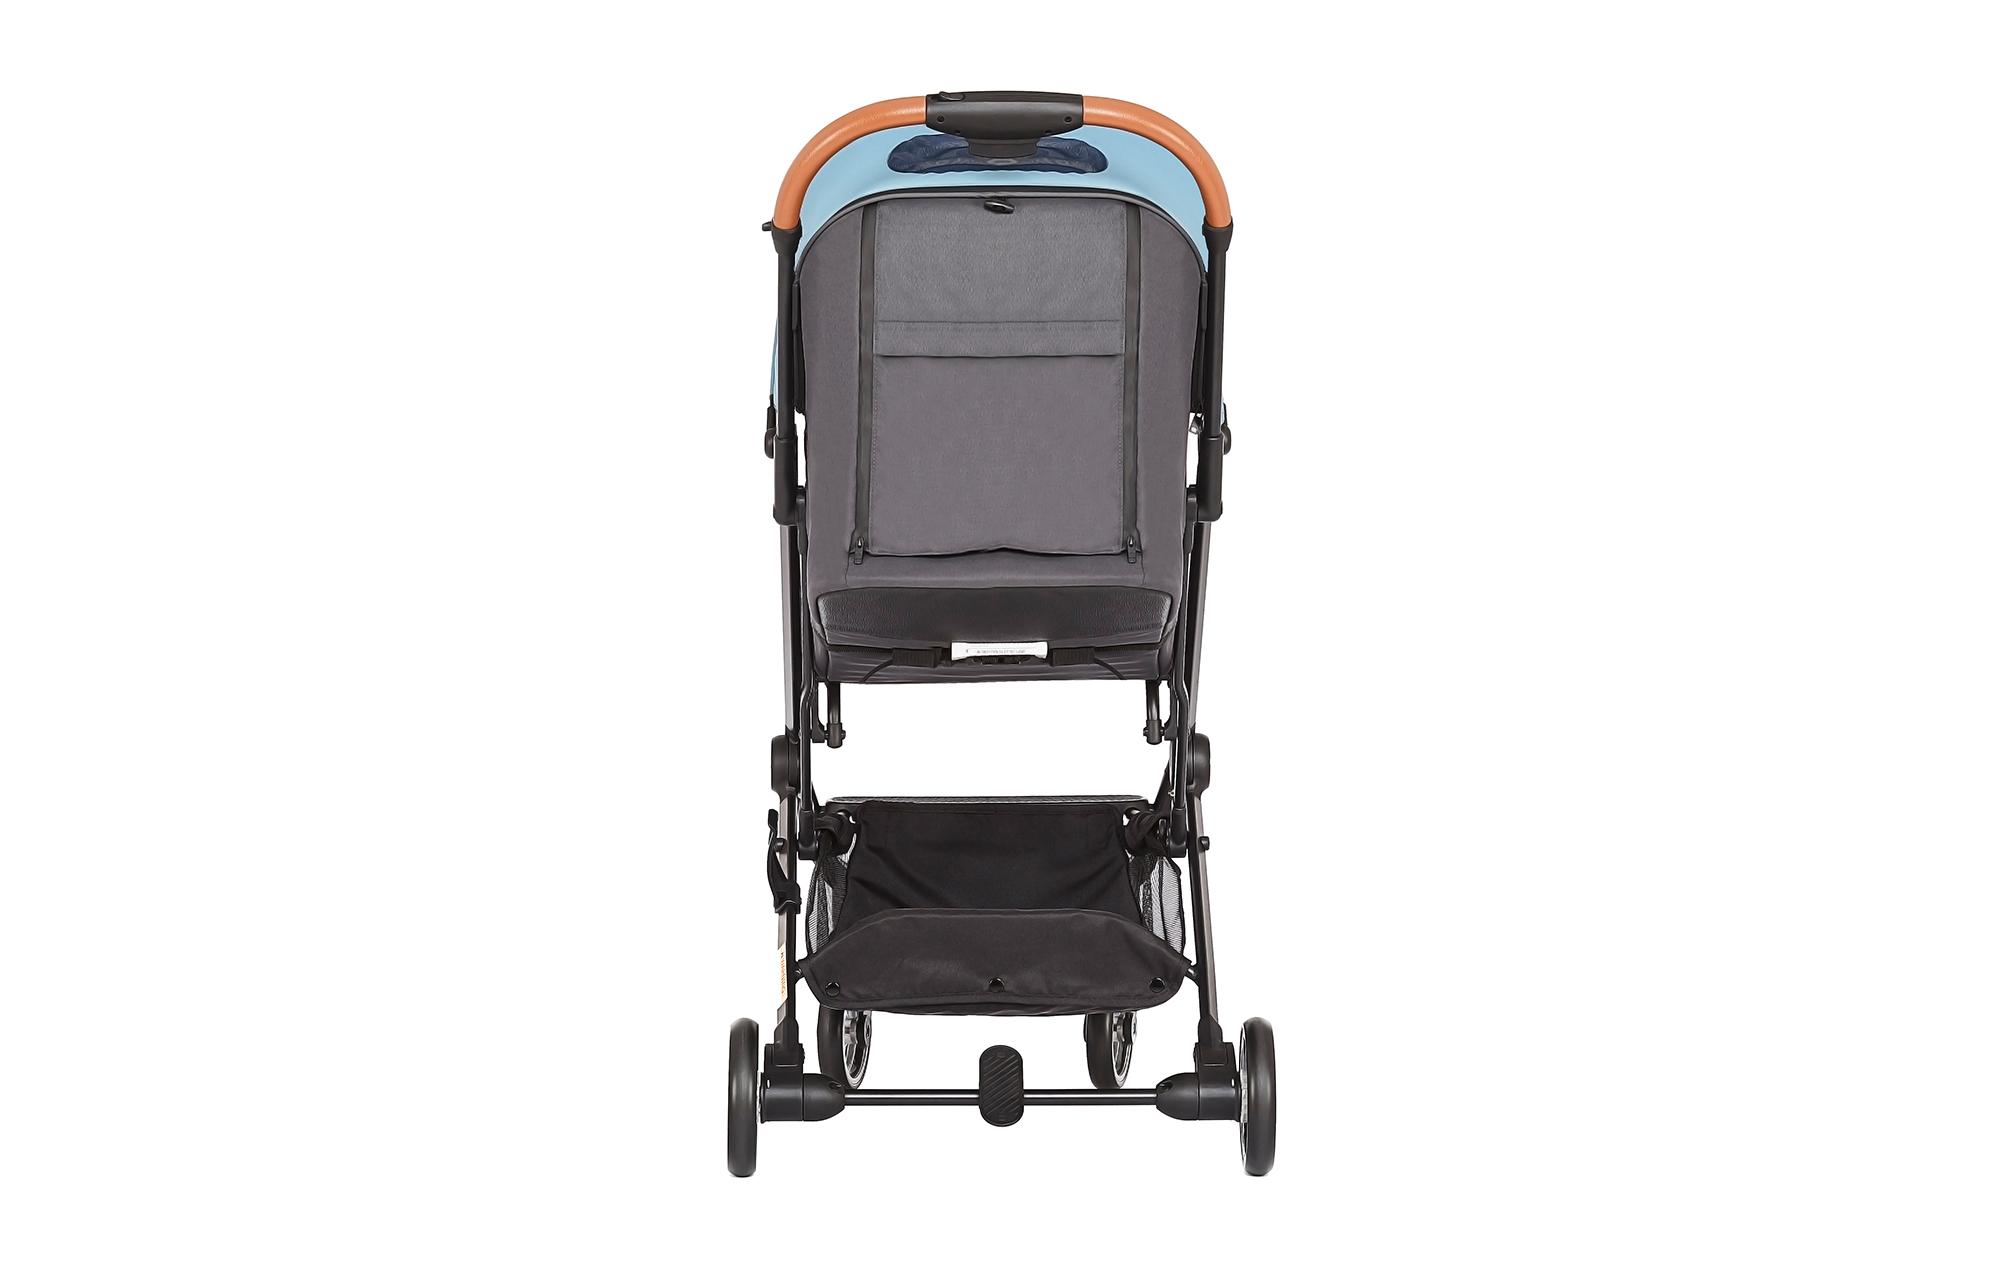 Urban Nimble Stroller - Blue